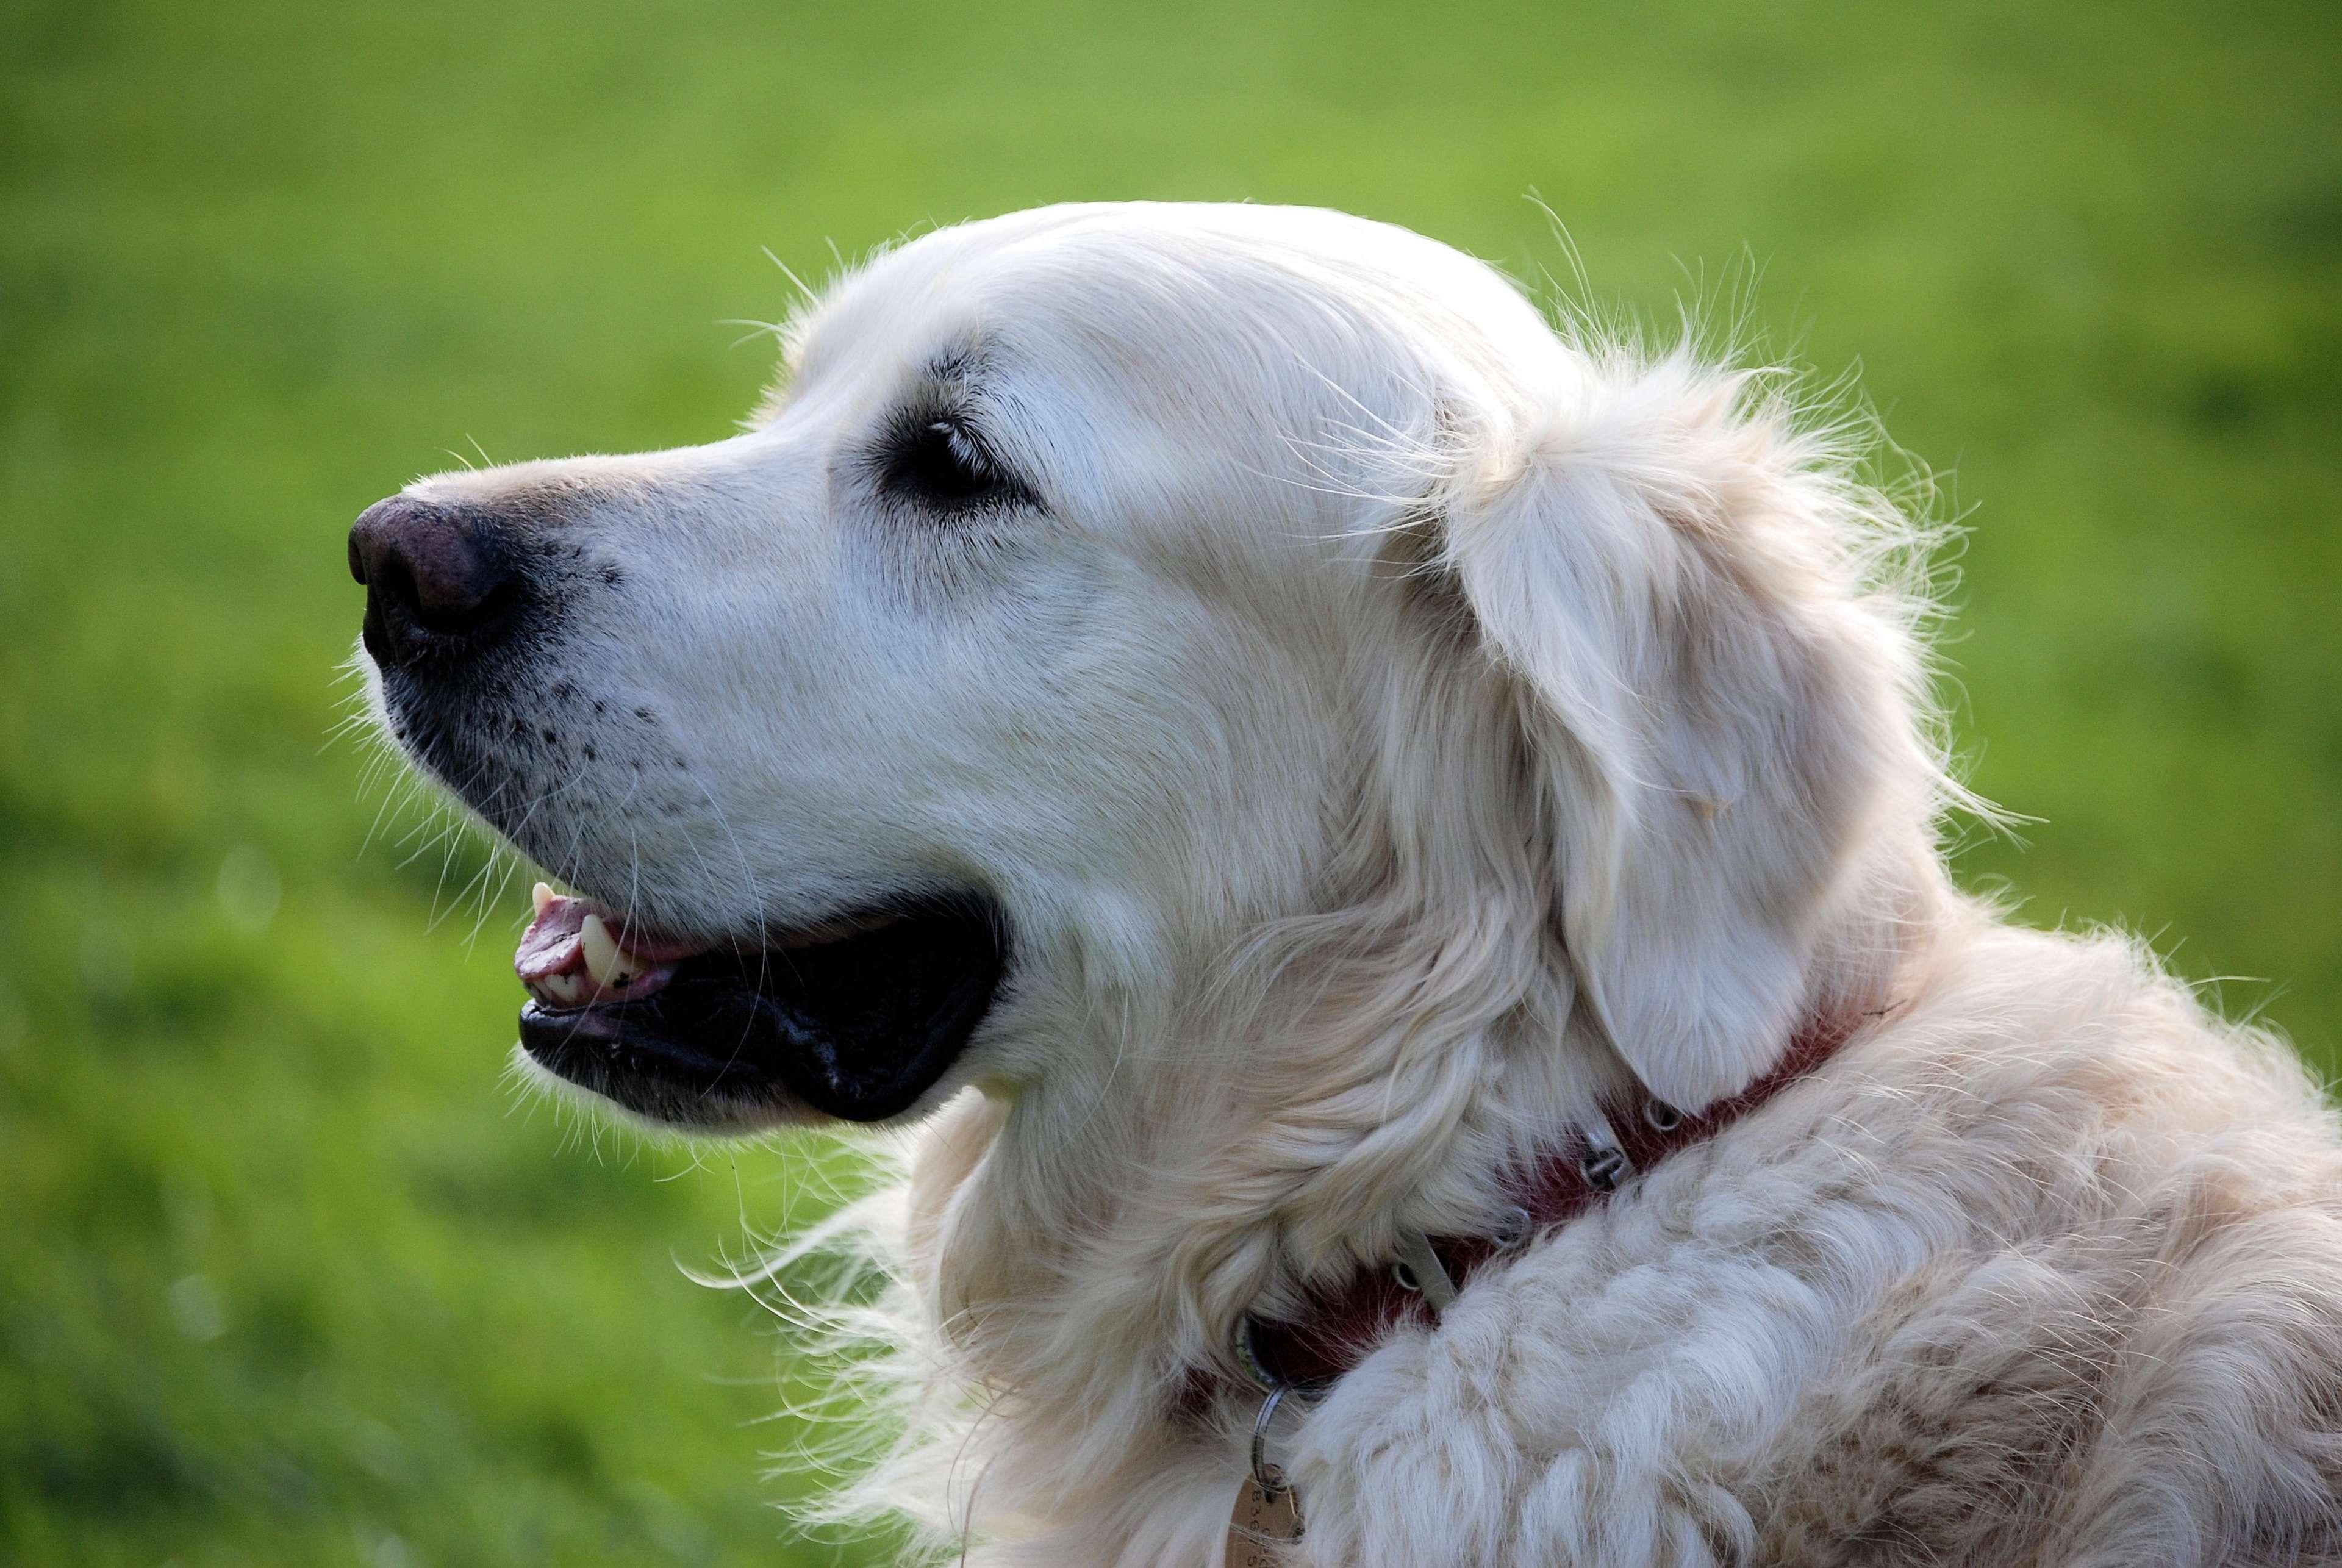 Fantastic Fluffy Canine Adorable Dog - 4d0d24091b768dfeaf0768f80c0171cf  2018_155028  .jpg